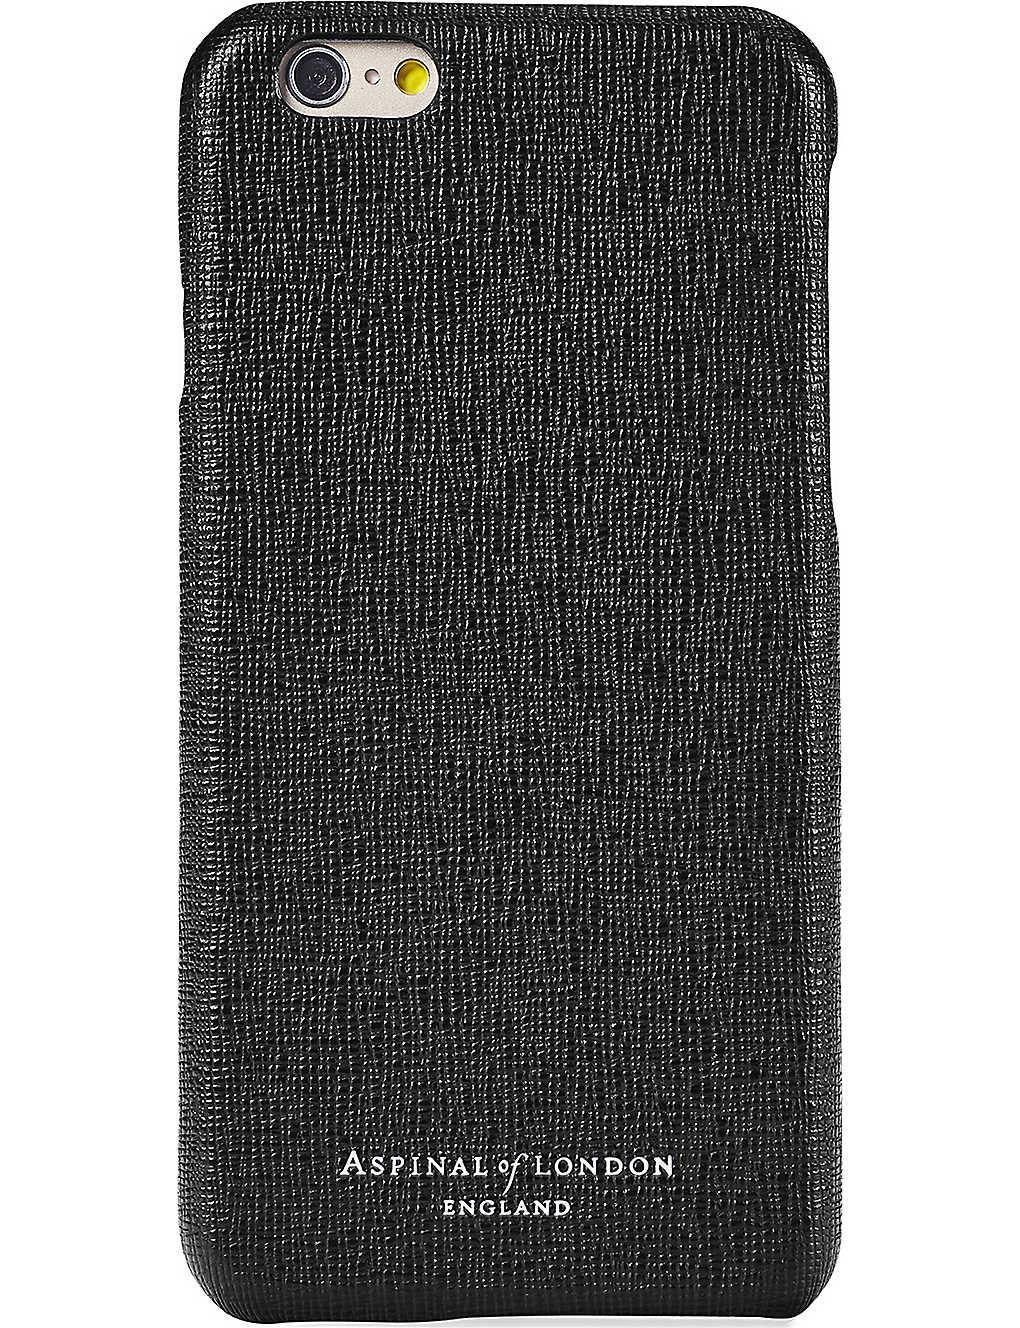 wholesale dealer 40e63 82f4c ASPINAL OF LONDON - Saffiano iPhone 6/6s leather case   Selfridges.com